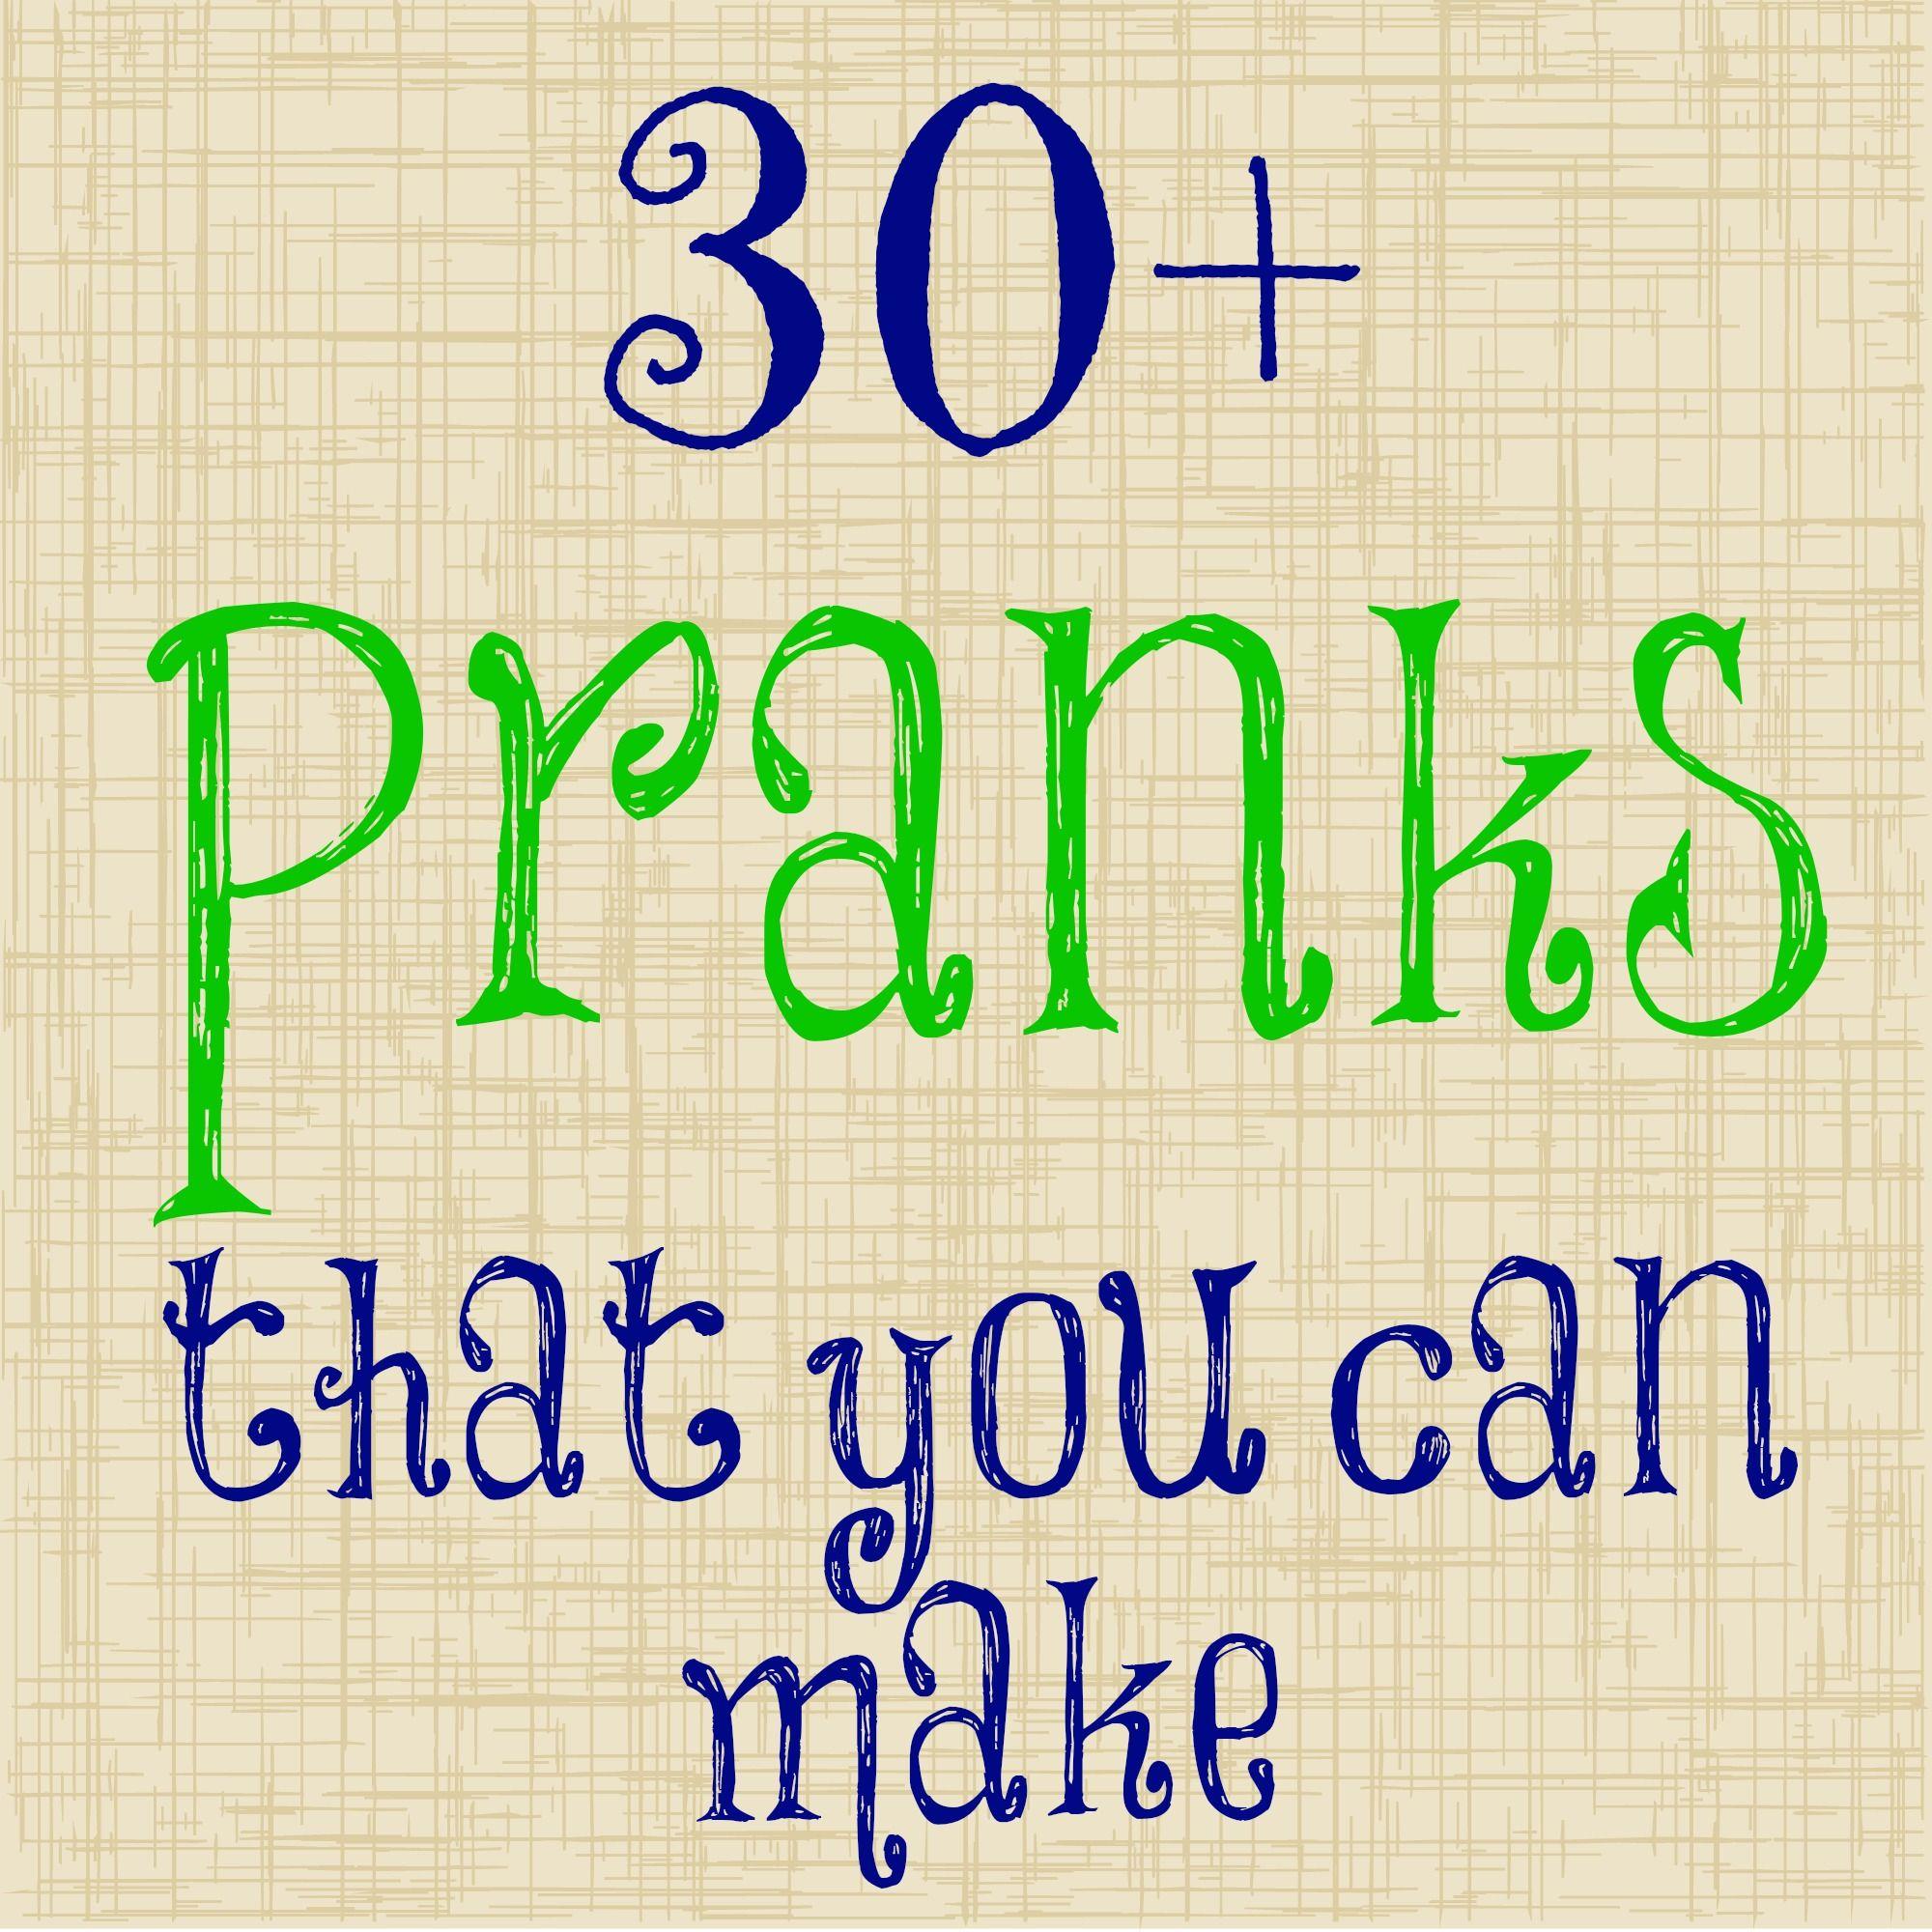 April Fool's Pranks that You Can Make | Dollar Store ...